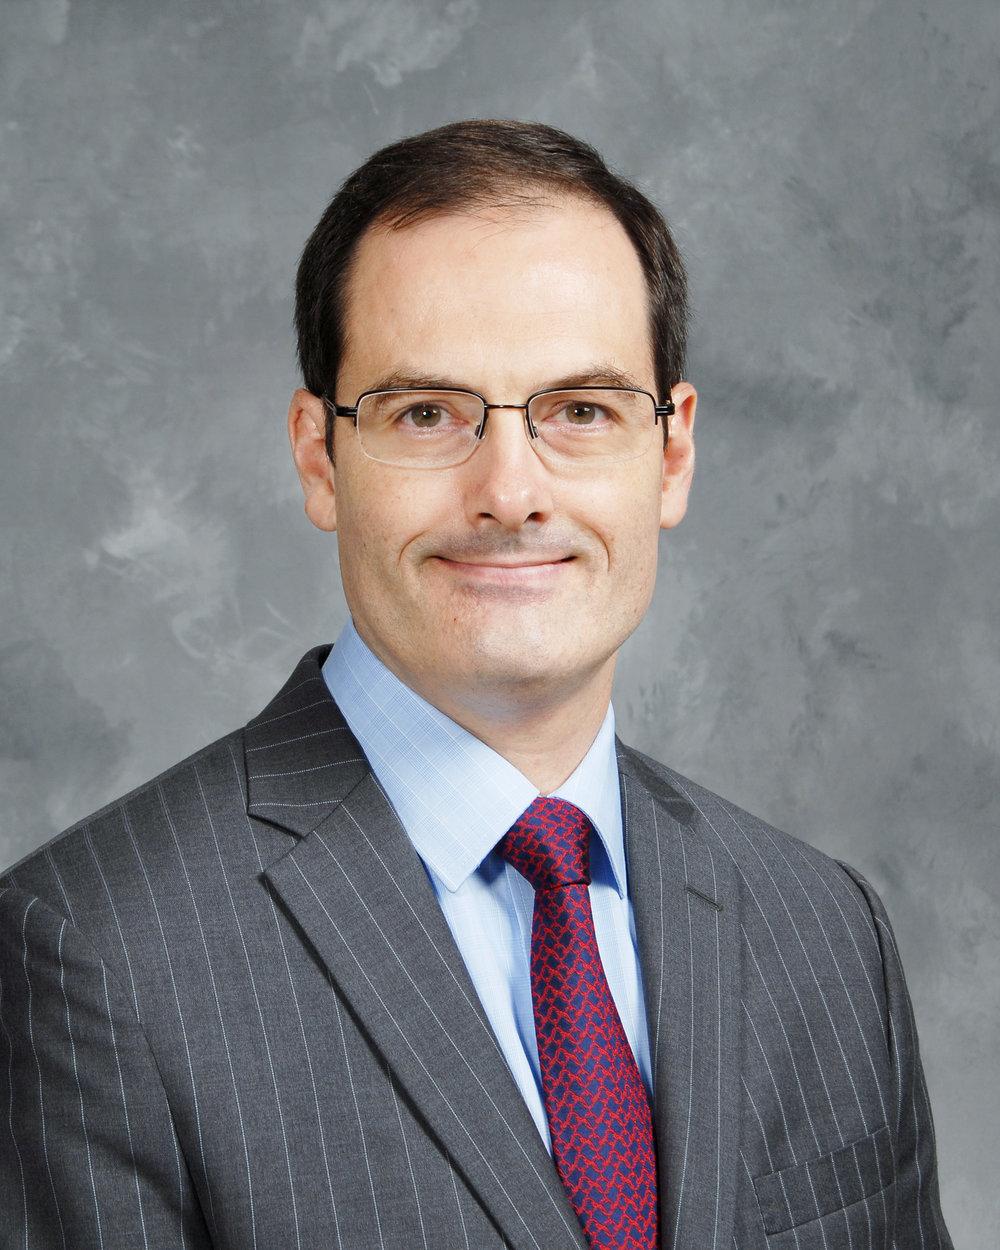 Christian Stewart, LLB, GDLP